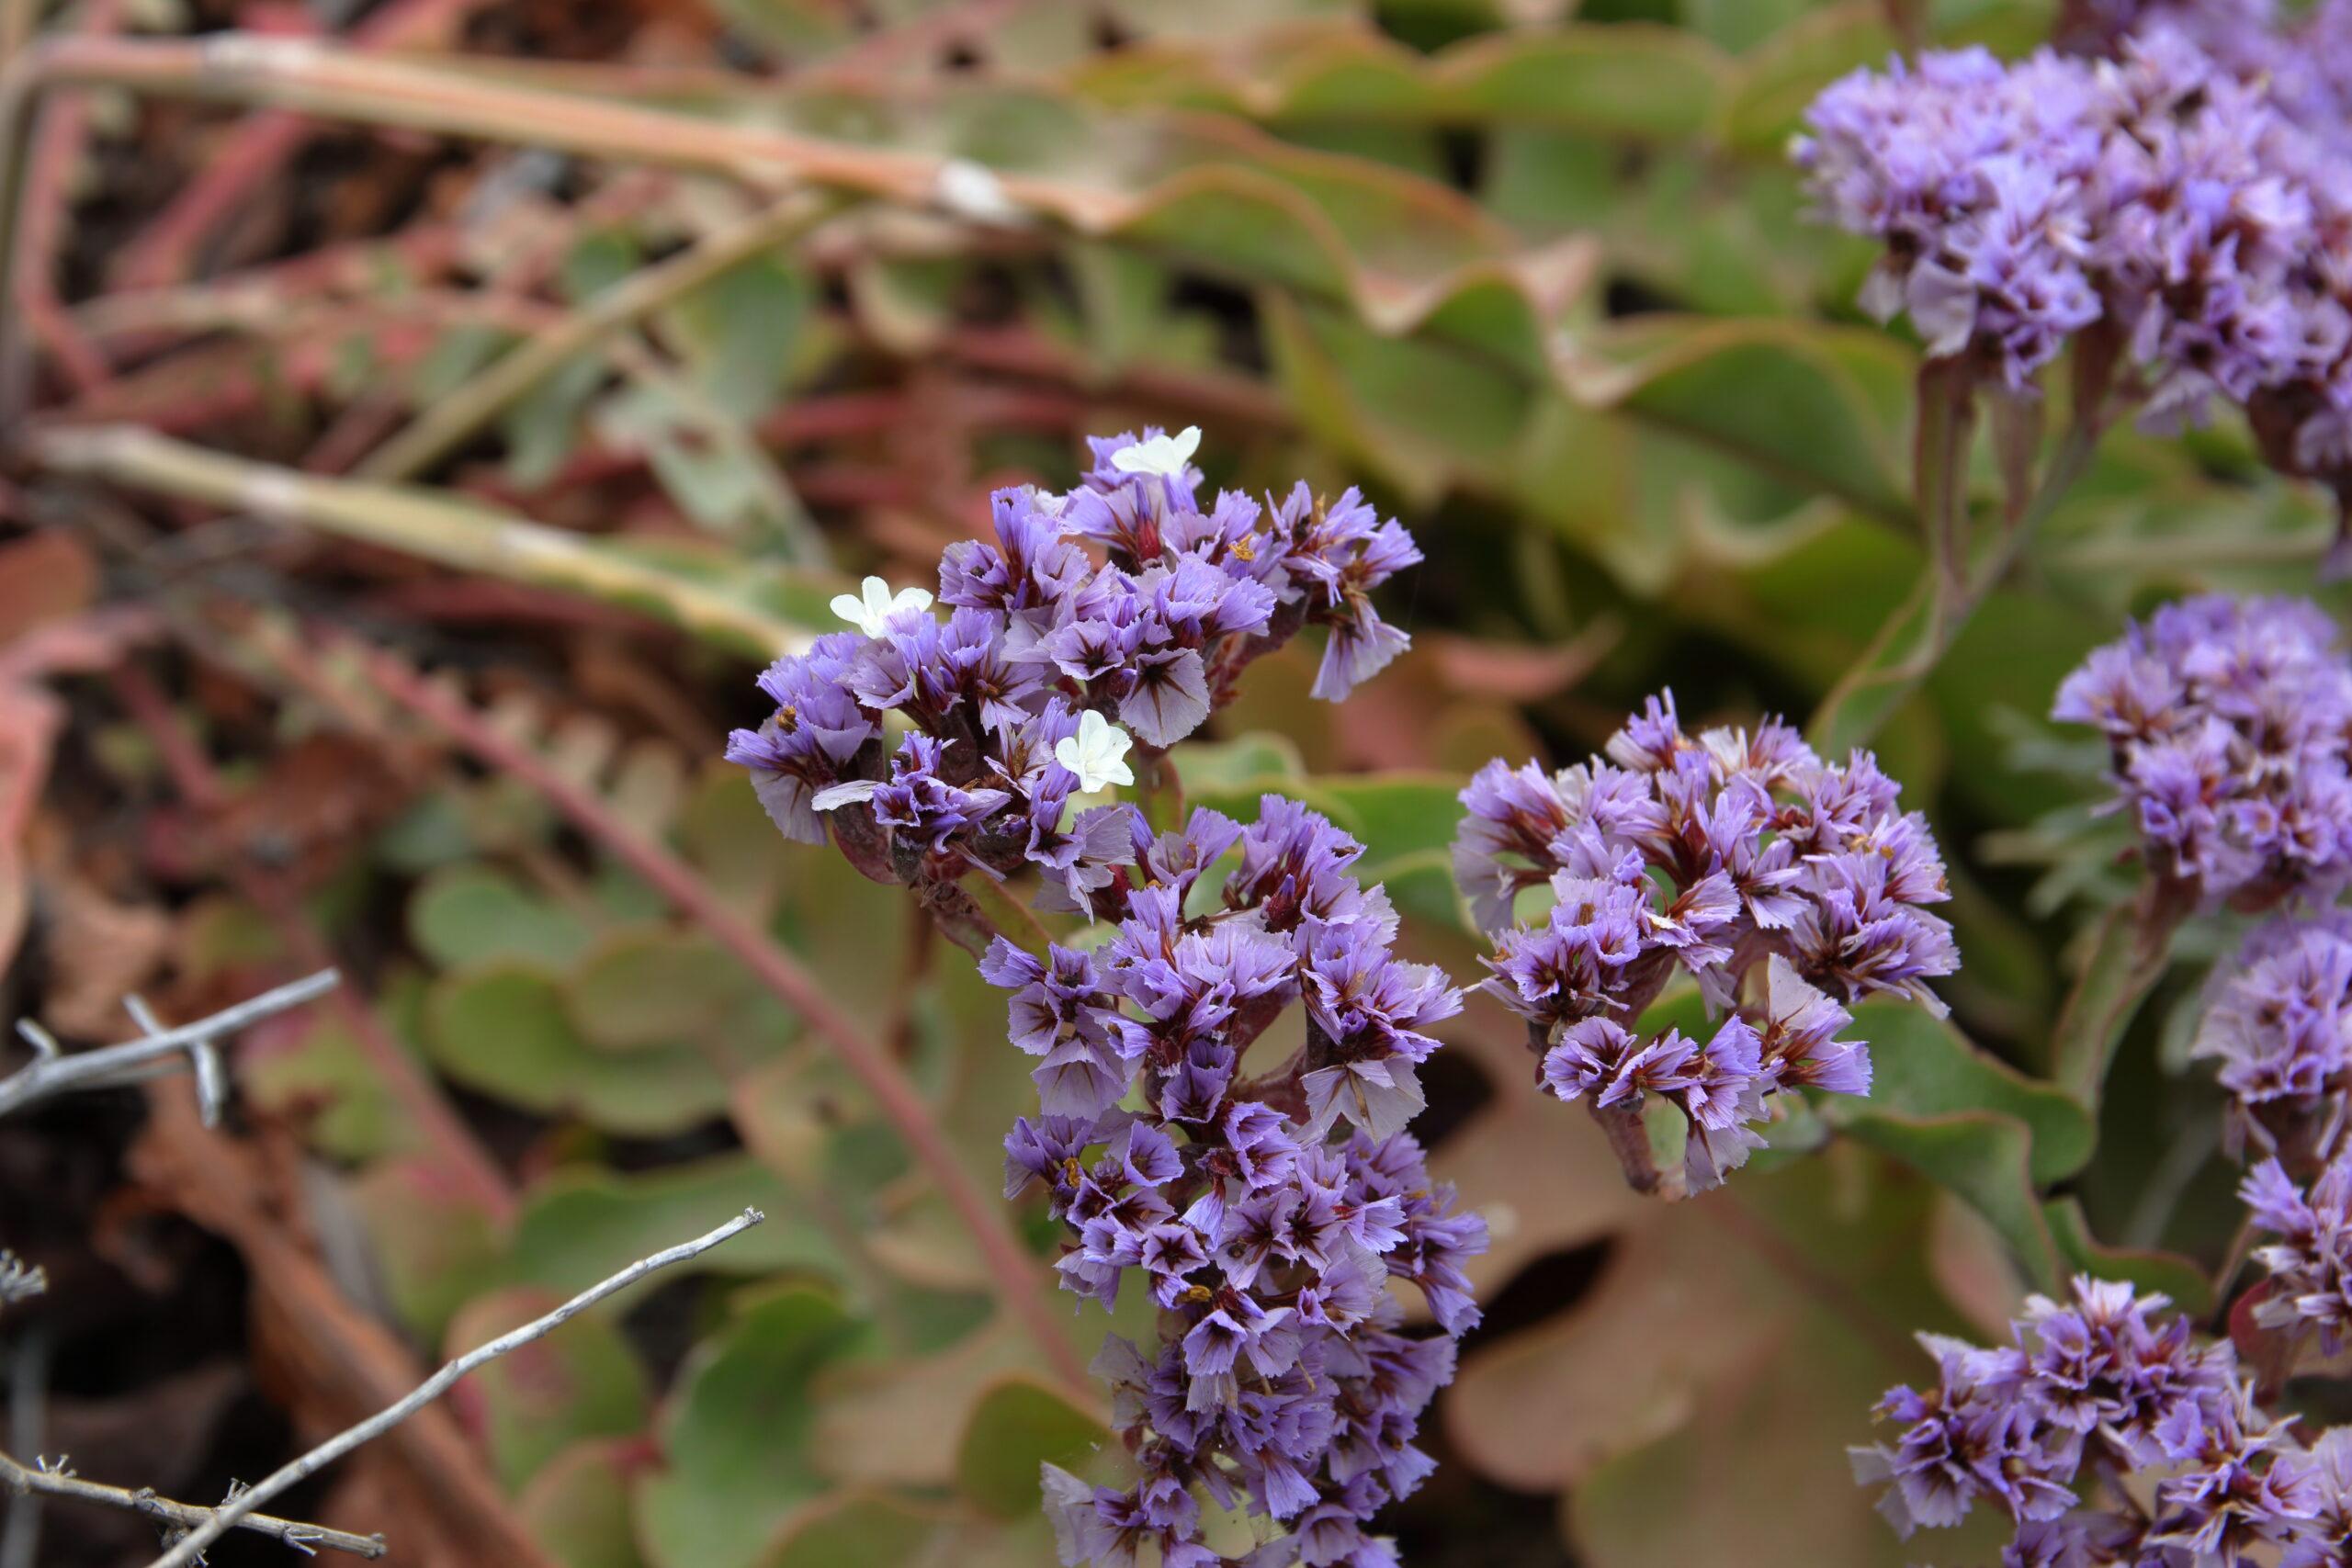 img_8615-flores-siempreviva-imbricada-limonium-imbricatum-detalle-flor-scaled.jpg